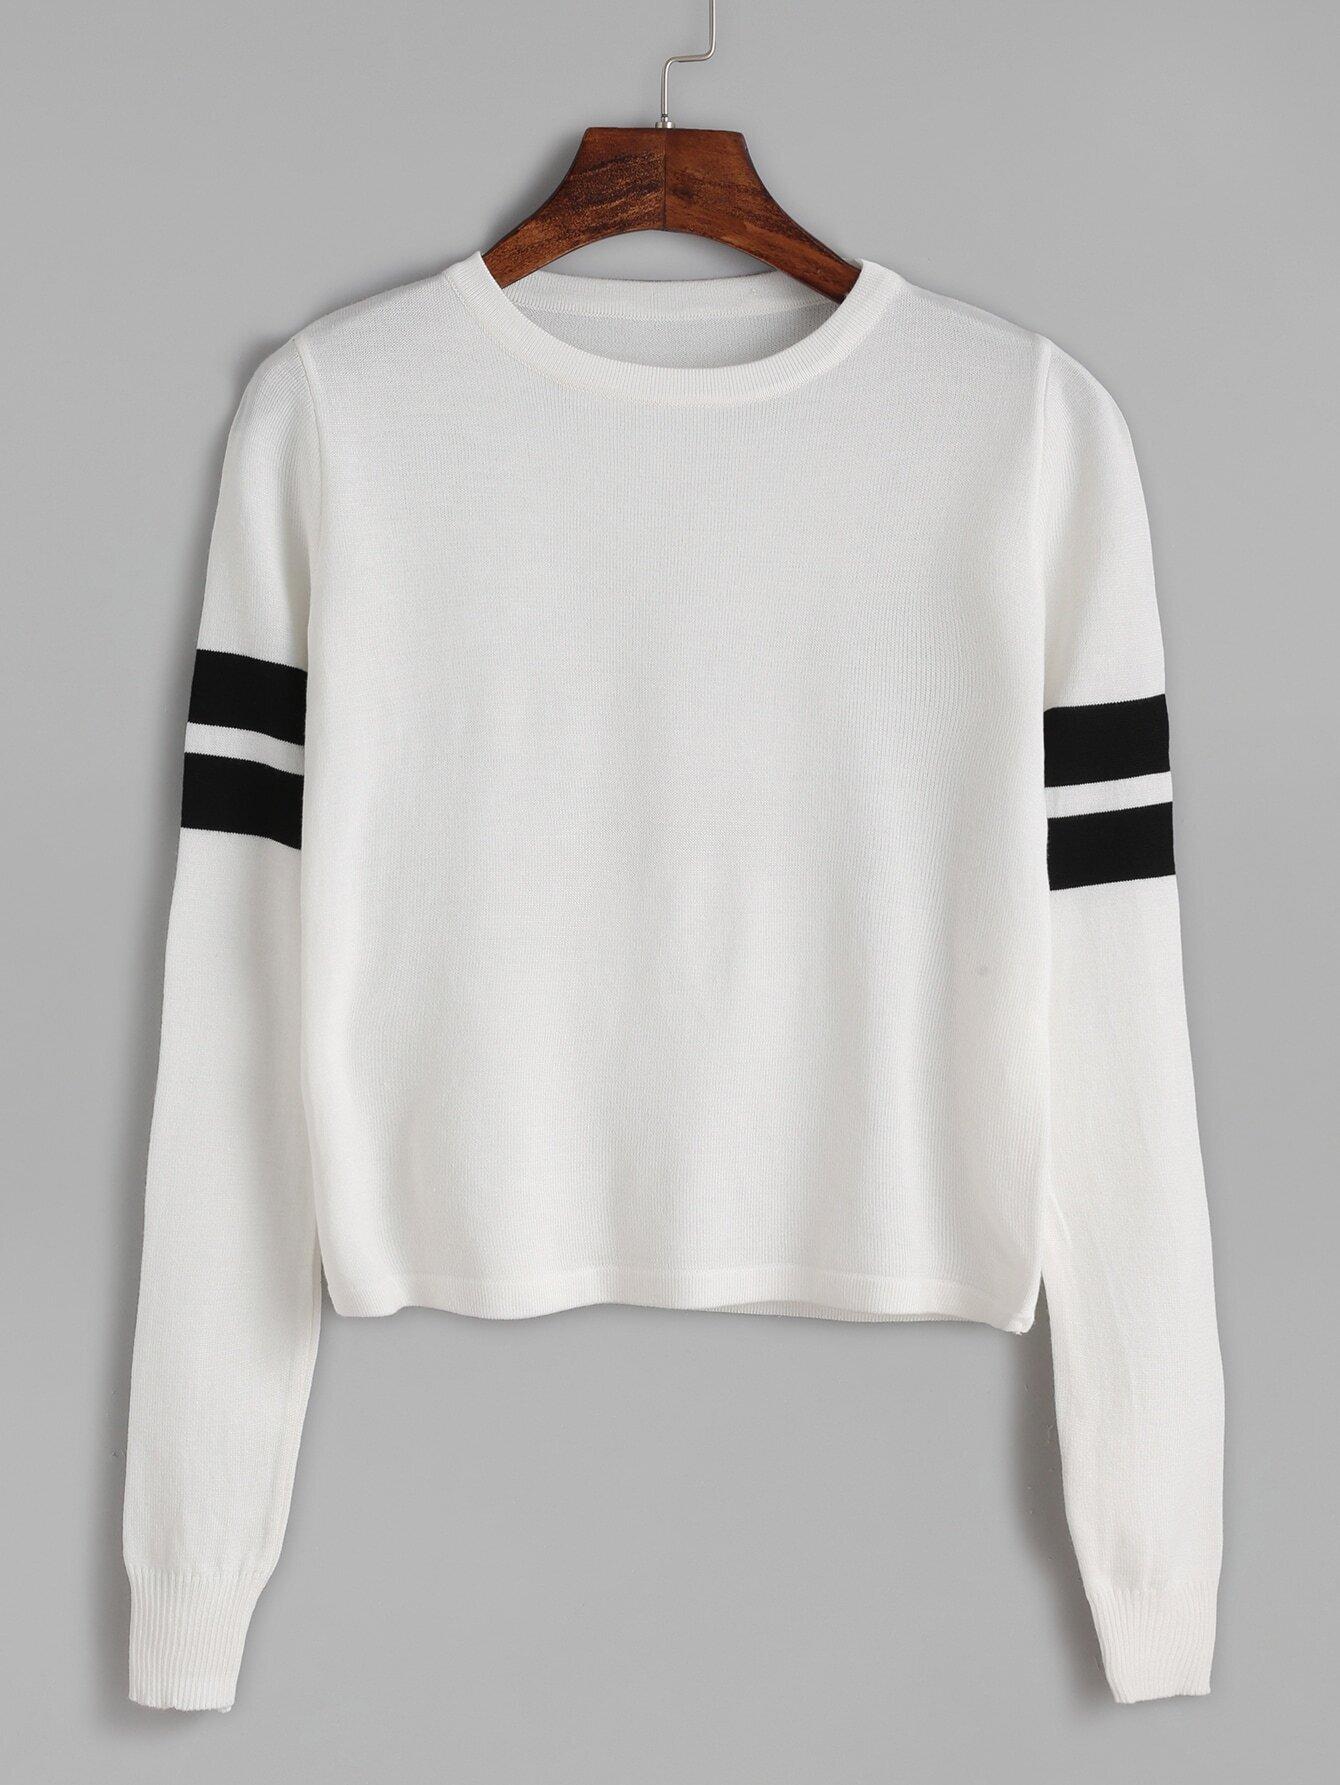 White Striped Trim Long Sleeve Knitwear